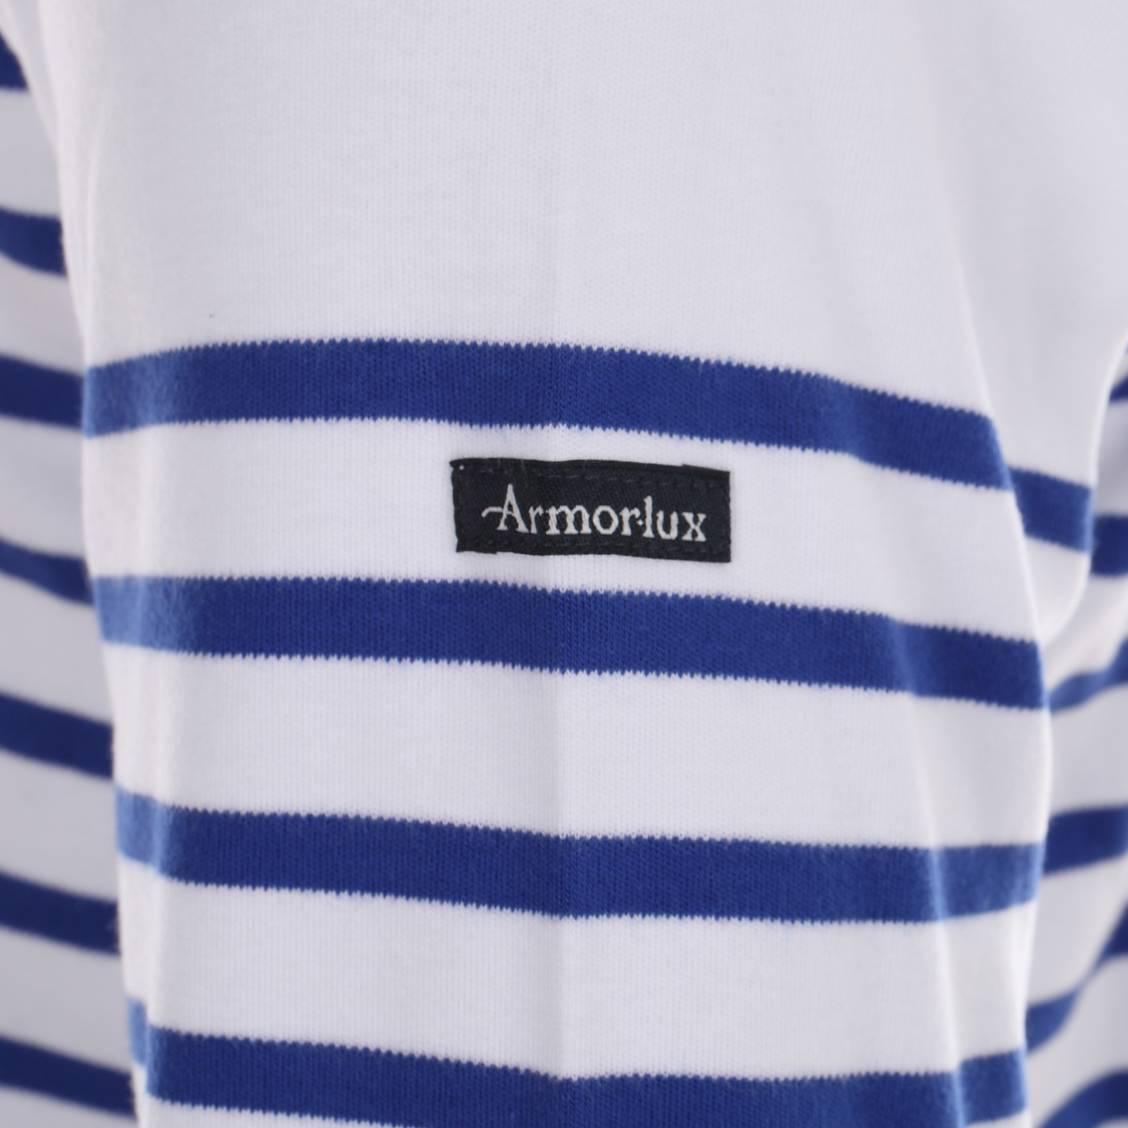 marinière amiral armor lux en coton